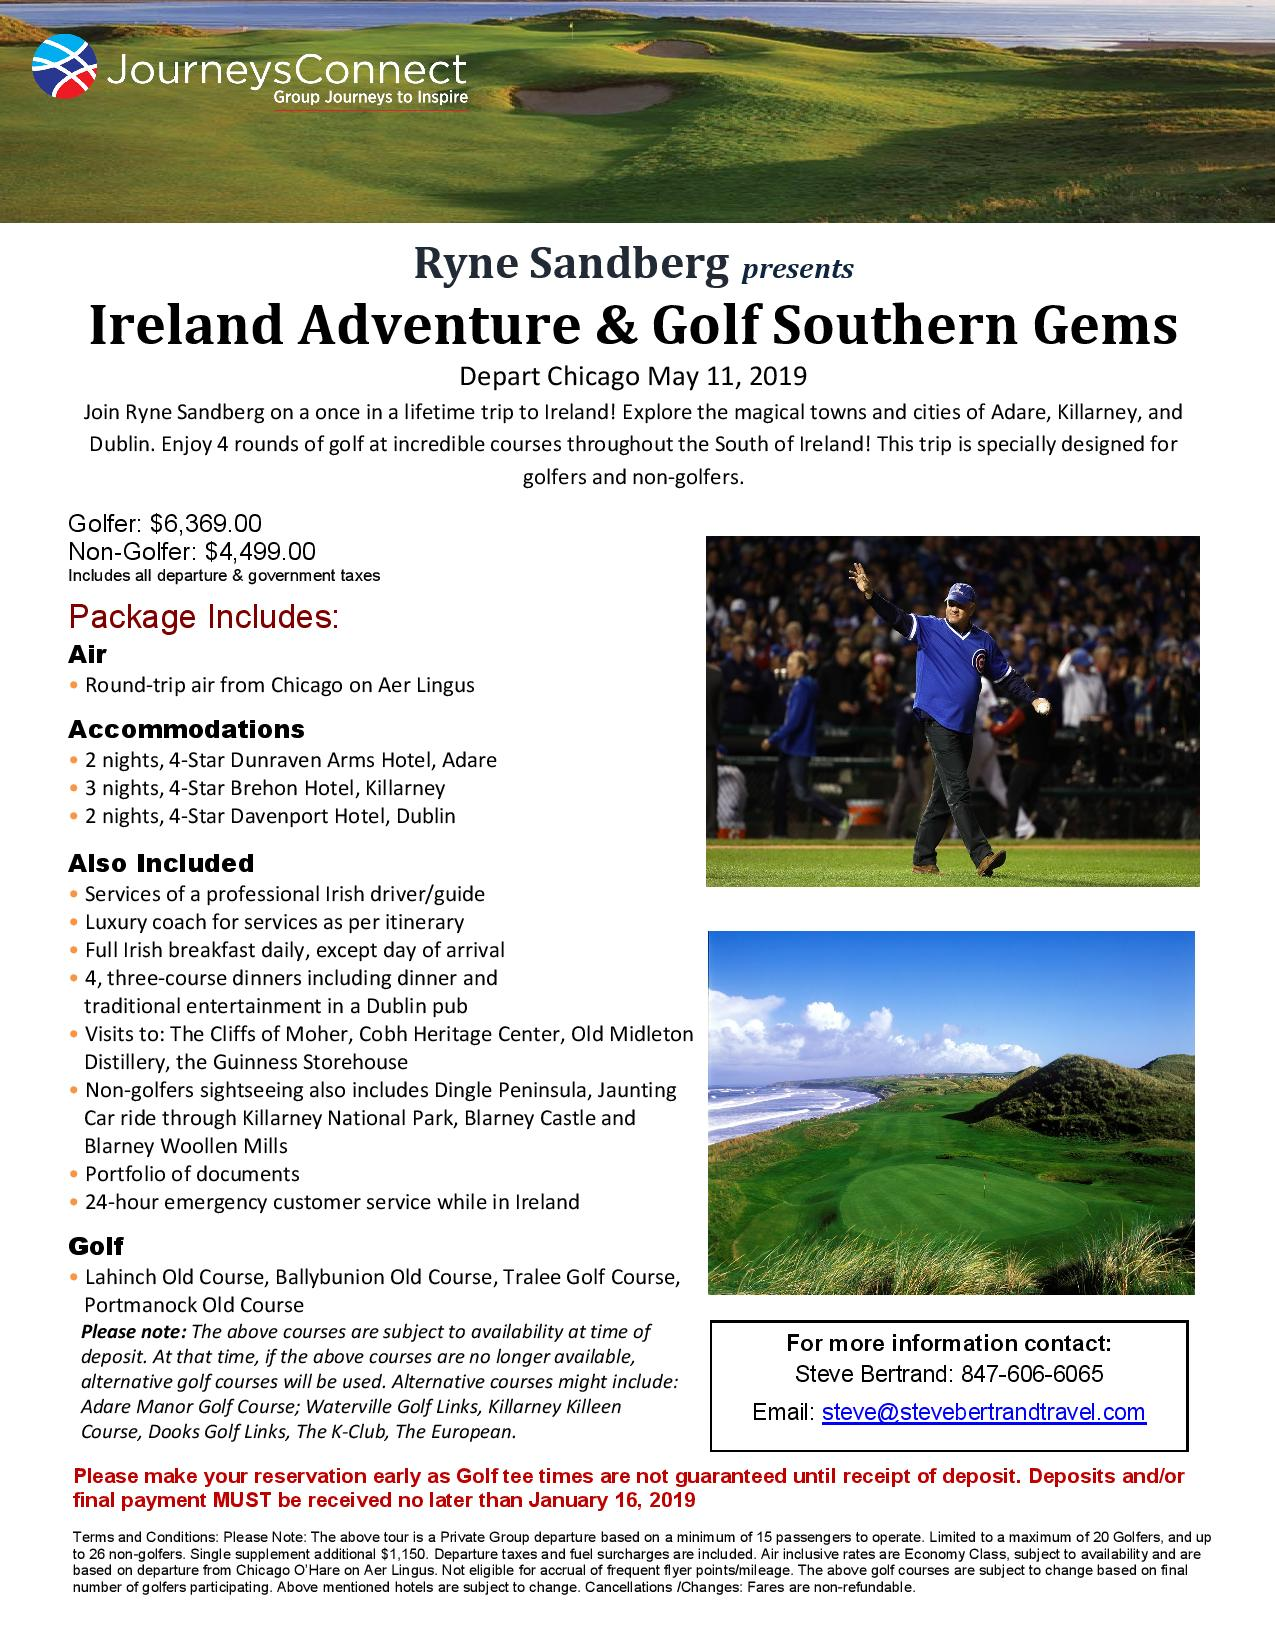 Ryne Sandberg Ireland Golf « SteveBertrandTravel